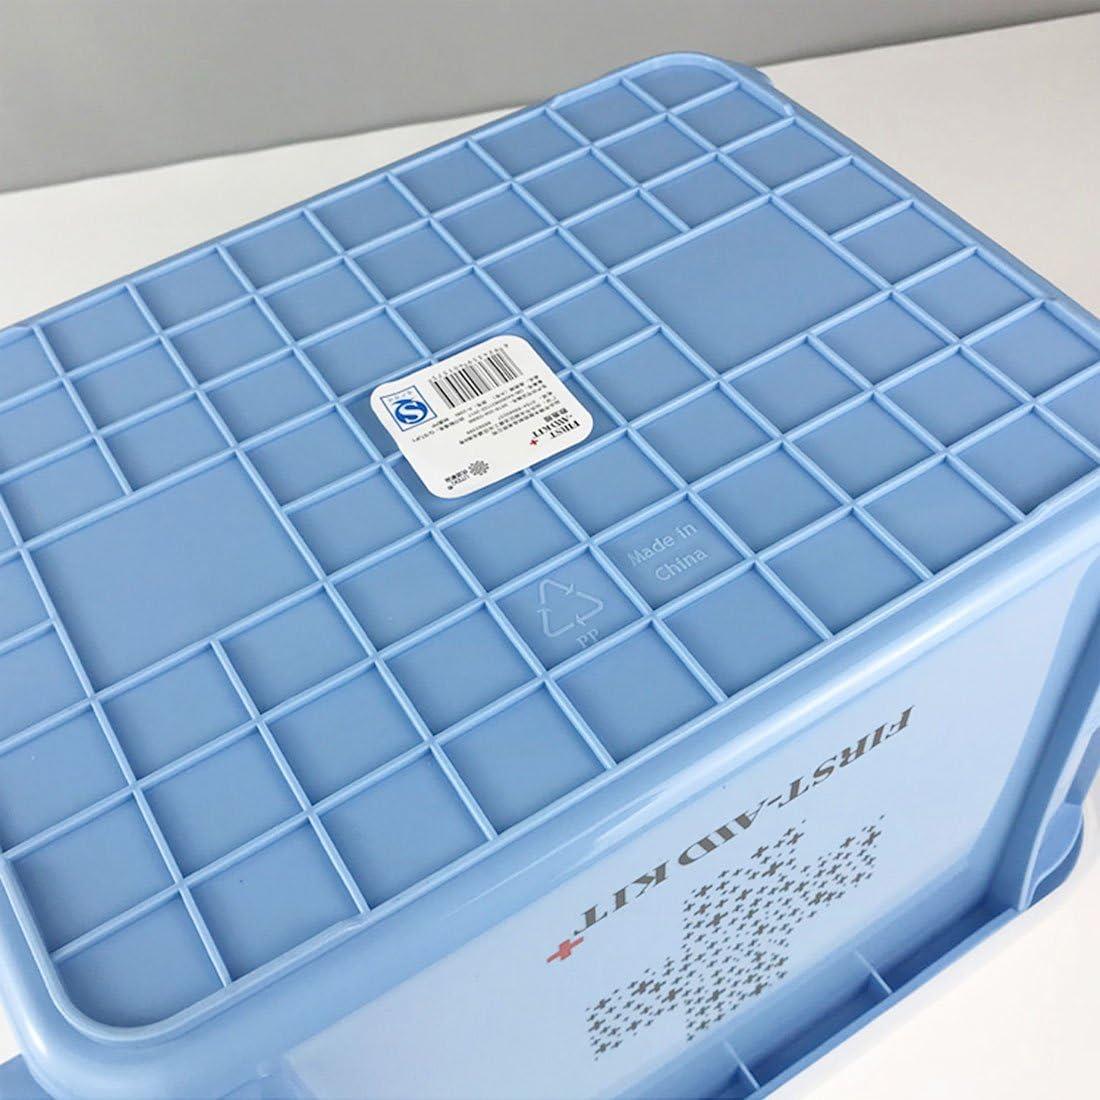 26.5*18.5*14.5cm Levoberg caja de farmacia 2/capas con compartimentos caja de almacenamiento de medicamentos port/átil viaje pl/ástico azul